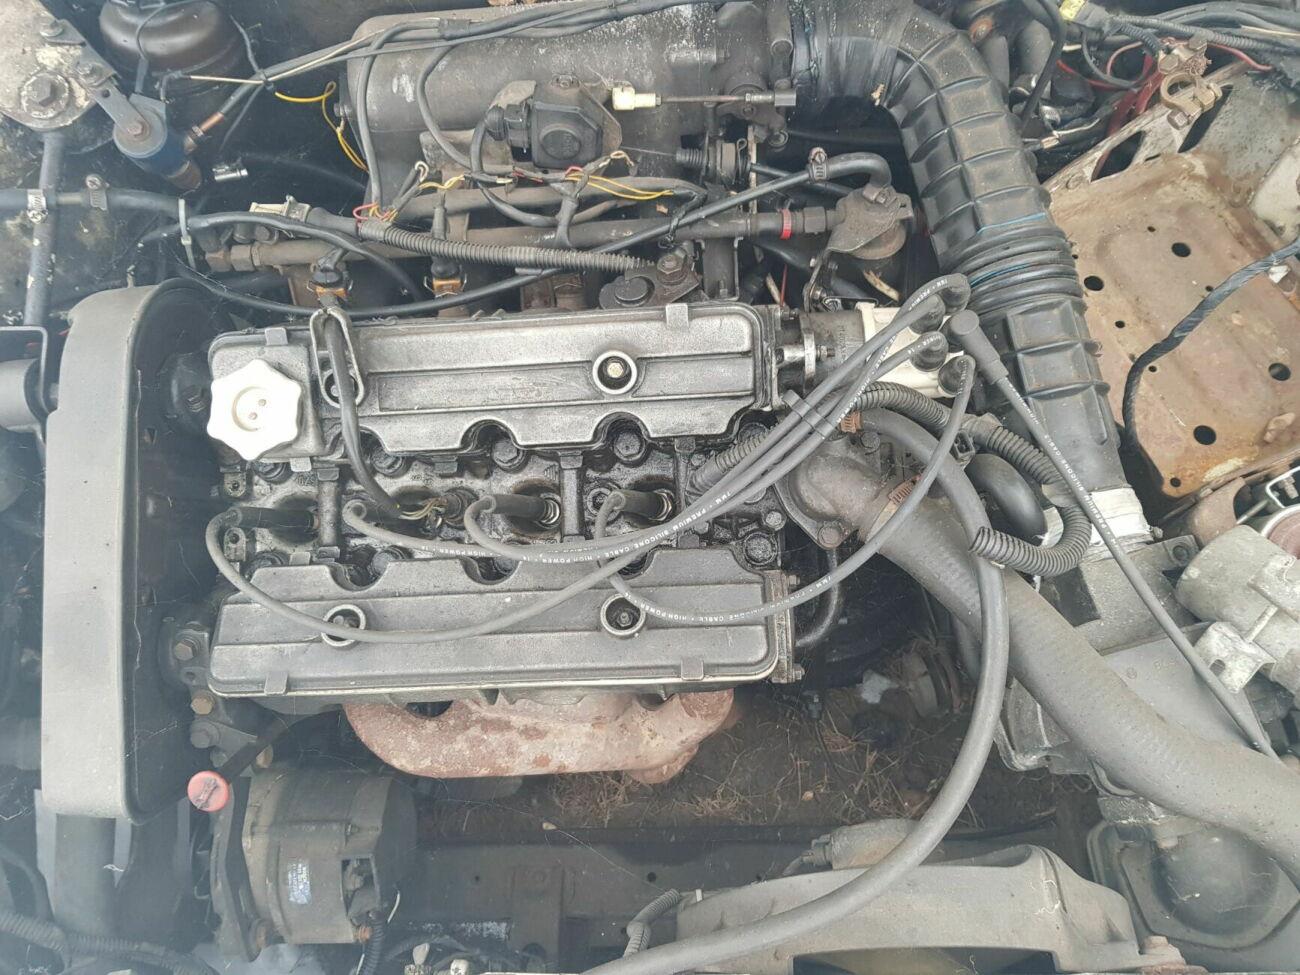 Мотор двигатель  лянча тема фиат крома lancia thema fiat croma